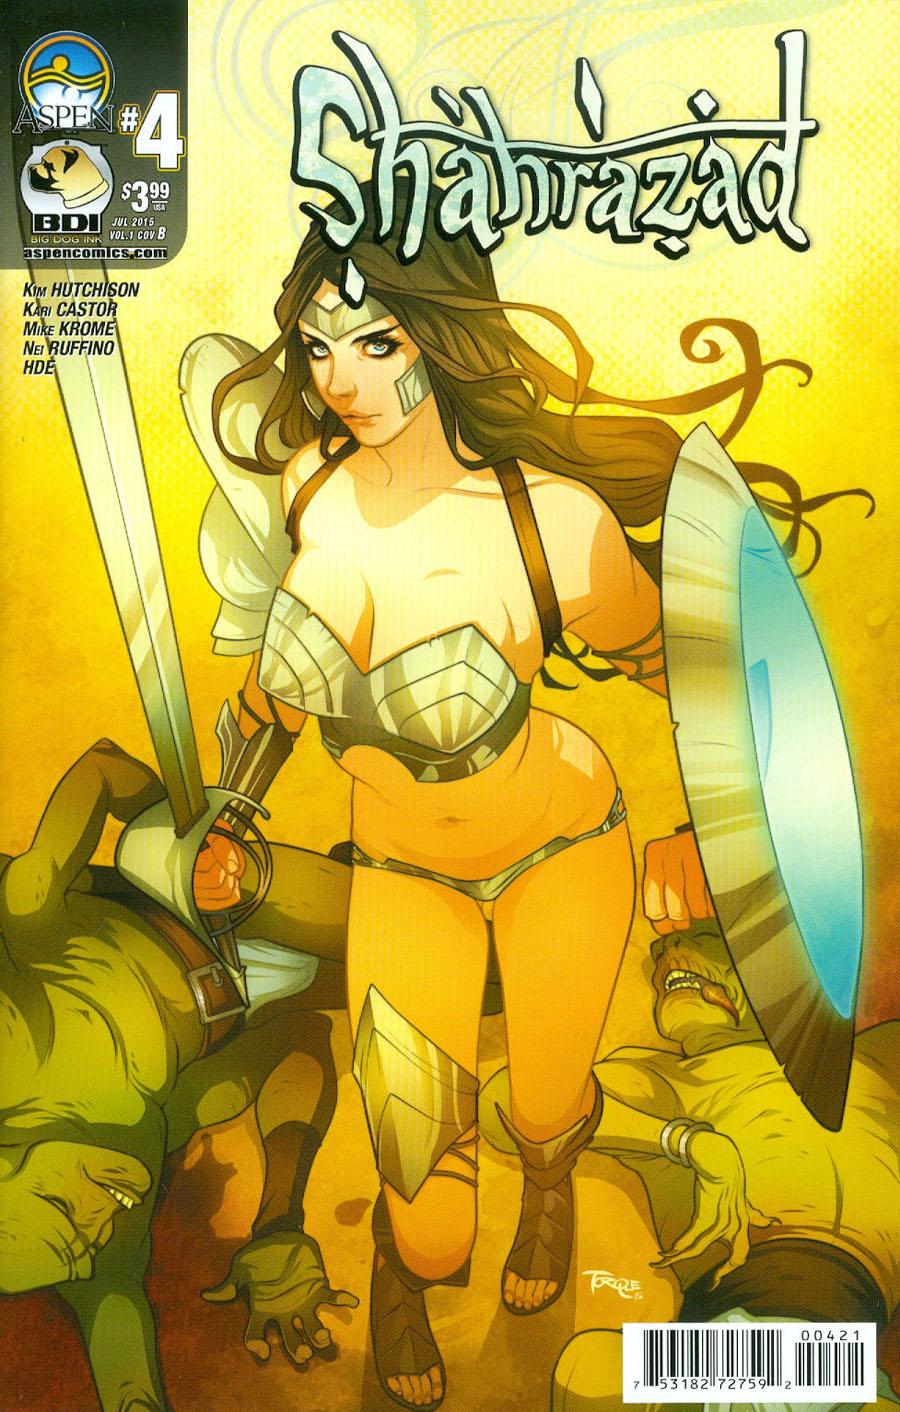 Shahrazad Vol 2 #4 Cover B Variant Elizabeth Torque Cover